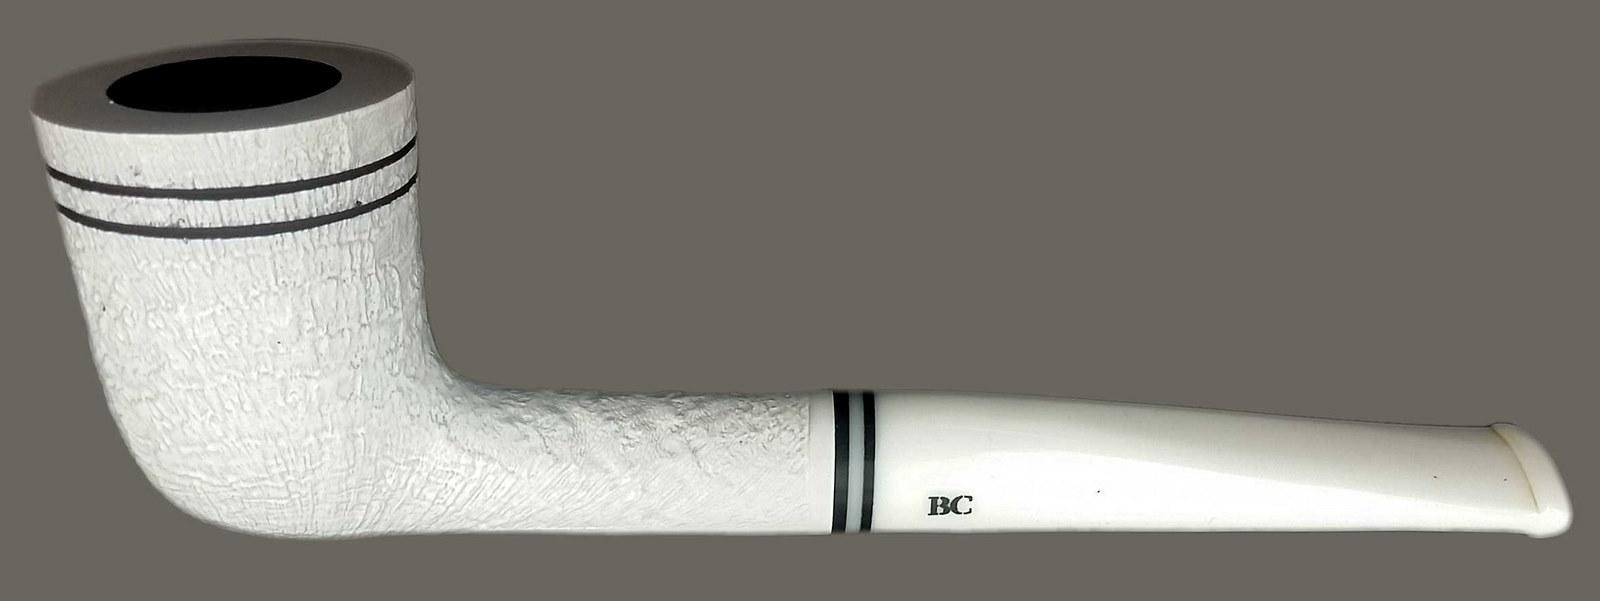 BCCHAMOS1402N